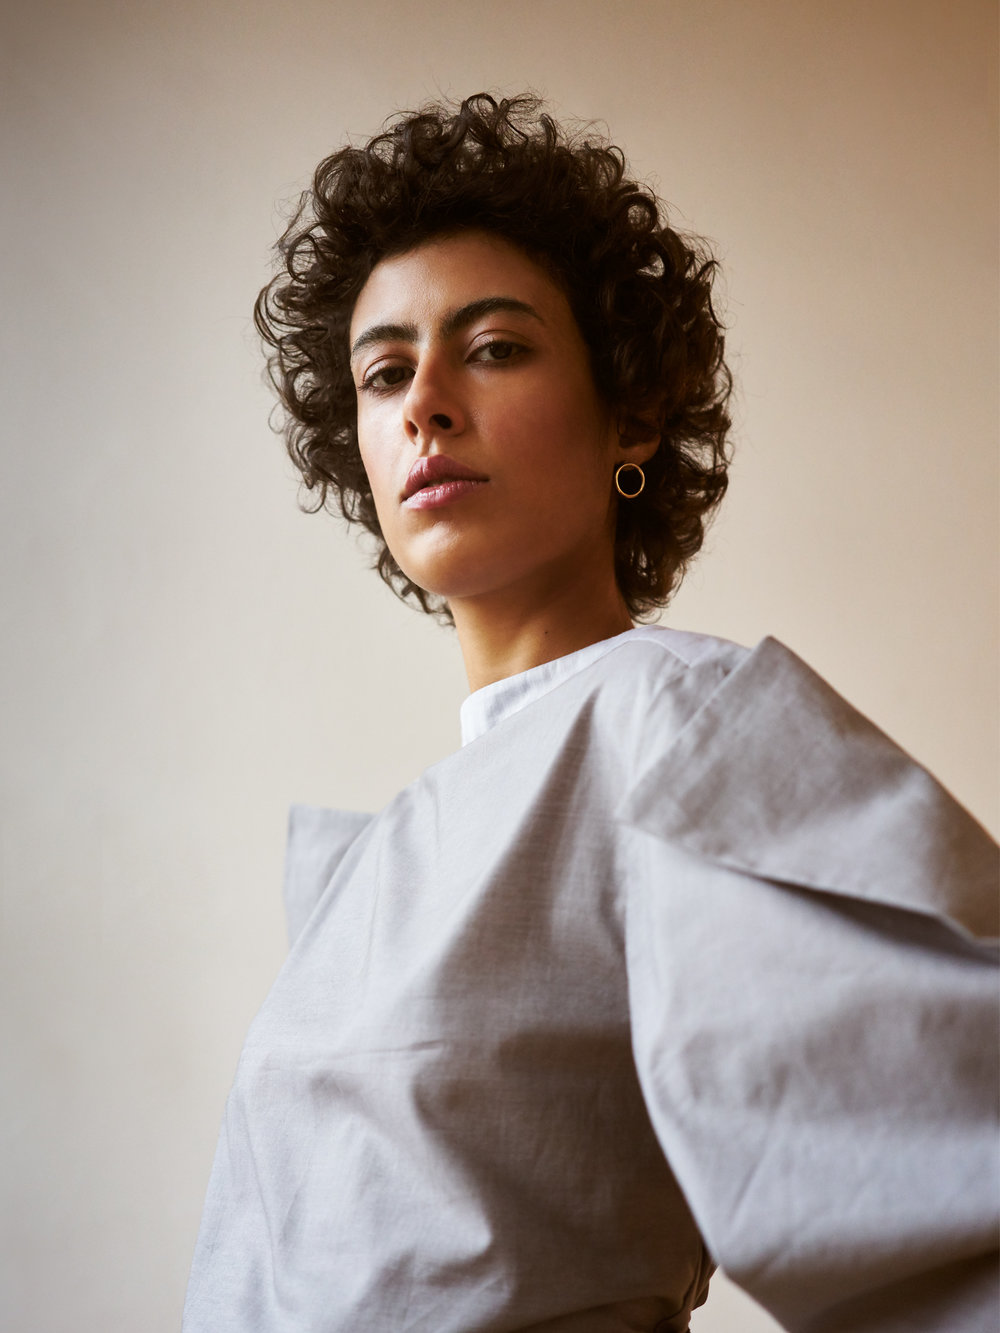 https://www.kmbylange.com/m-o-t-a-n-k-a/gray-puffed-sleeves-blouse20181204_0162.jpg